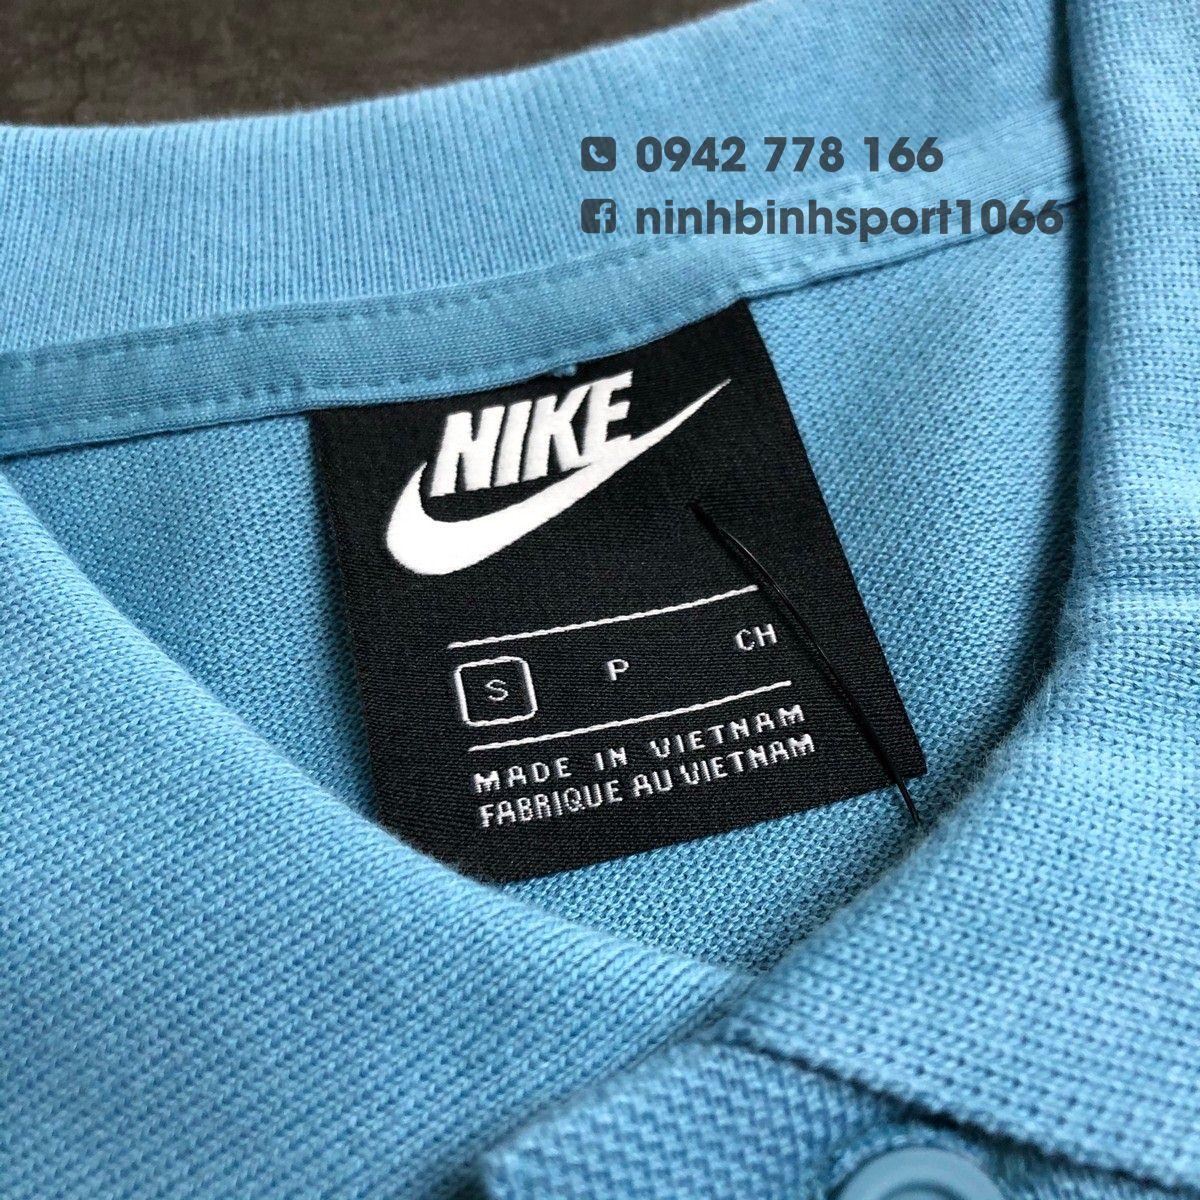 Áo thể thao nam Nike Sportswear Polo Collar CJ4457-424